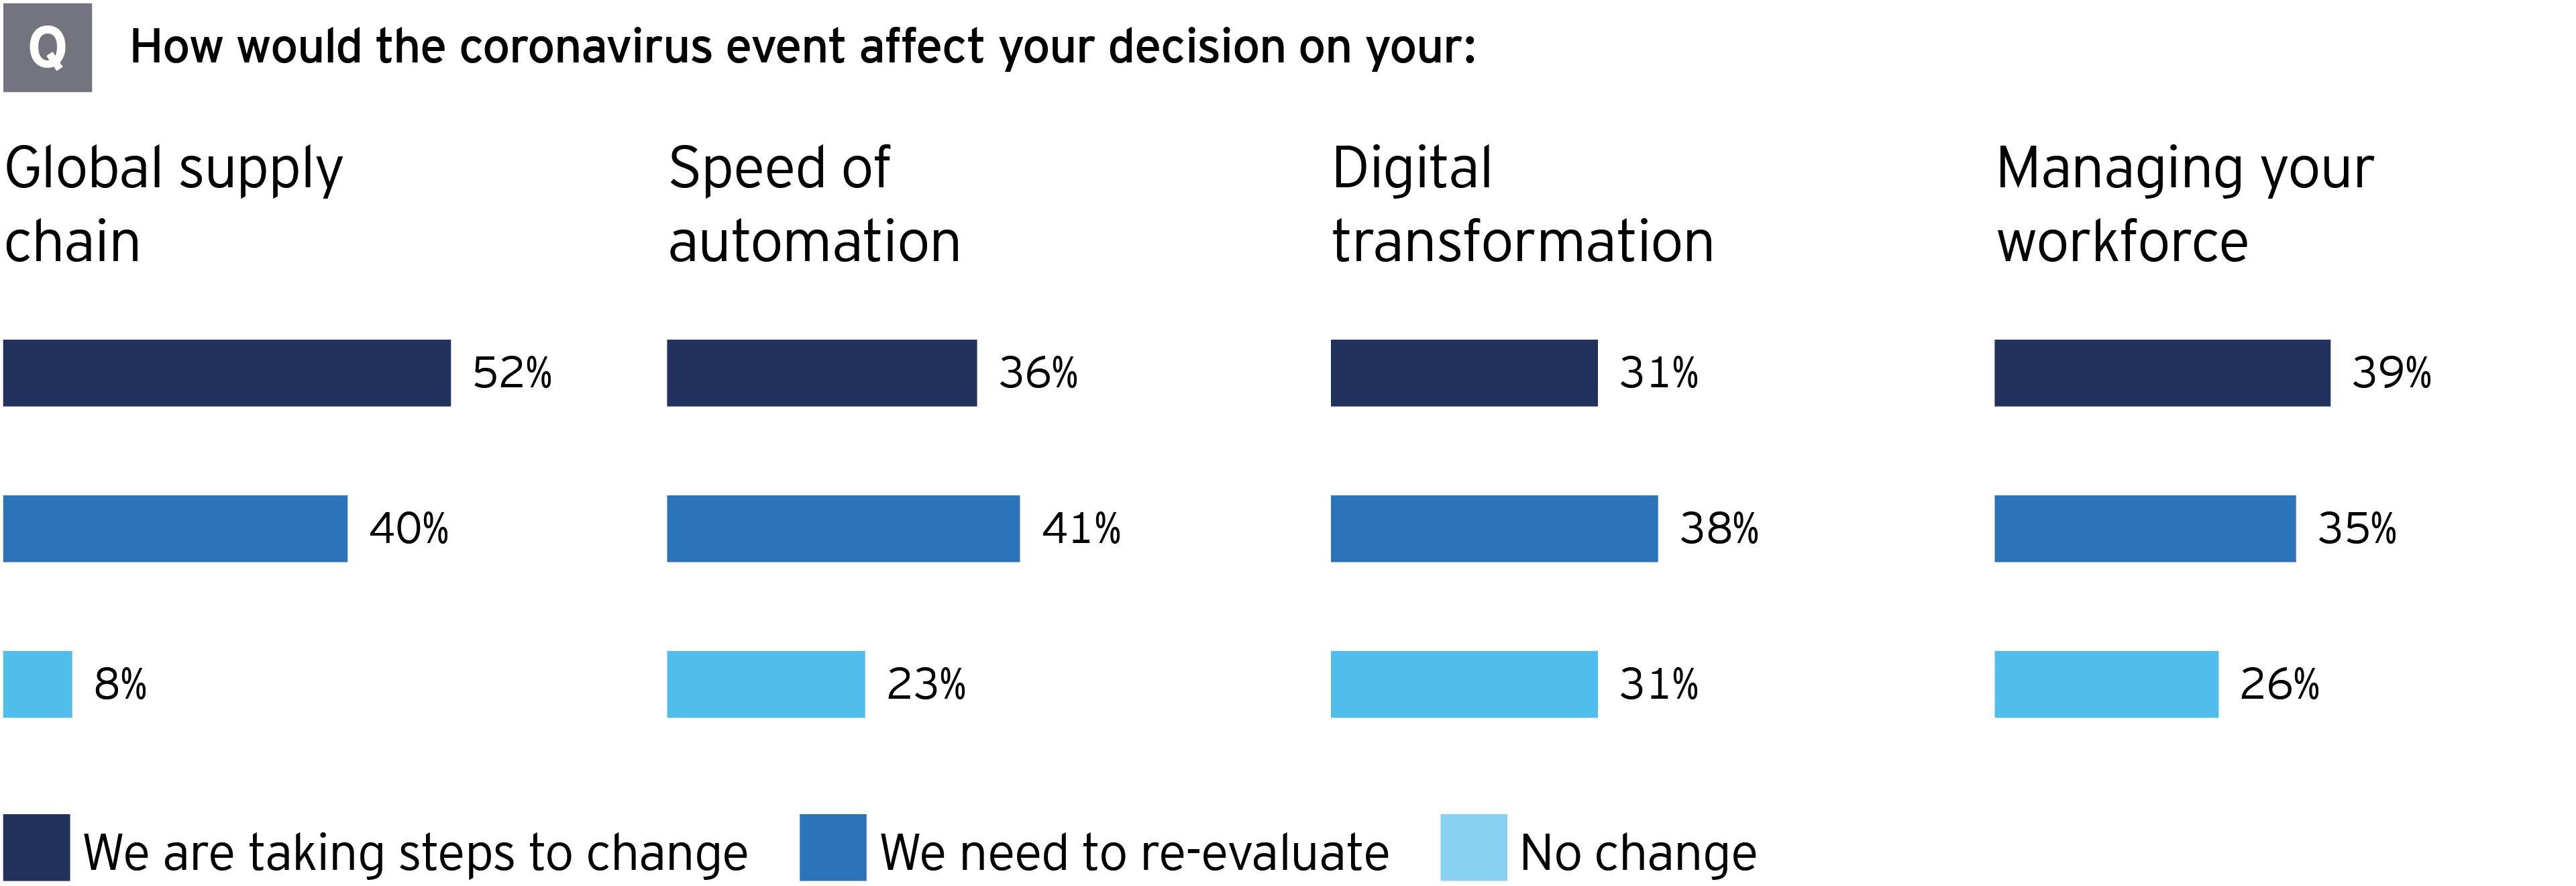 EY M&A survey how coronavirus affects business decisions